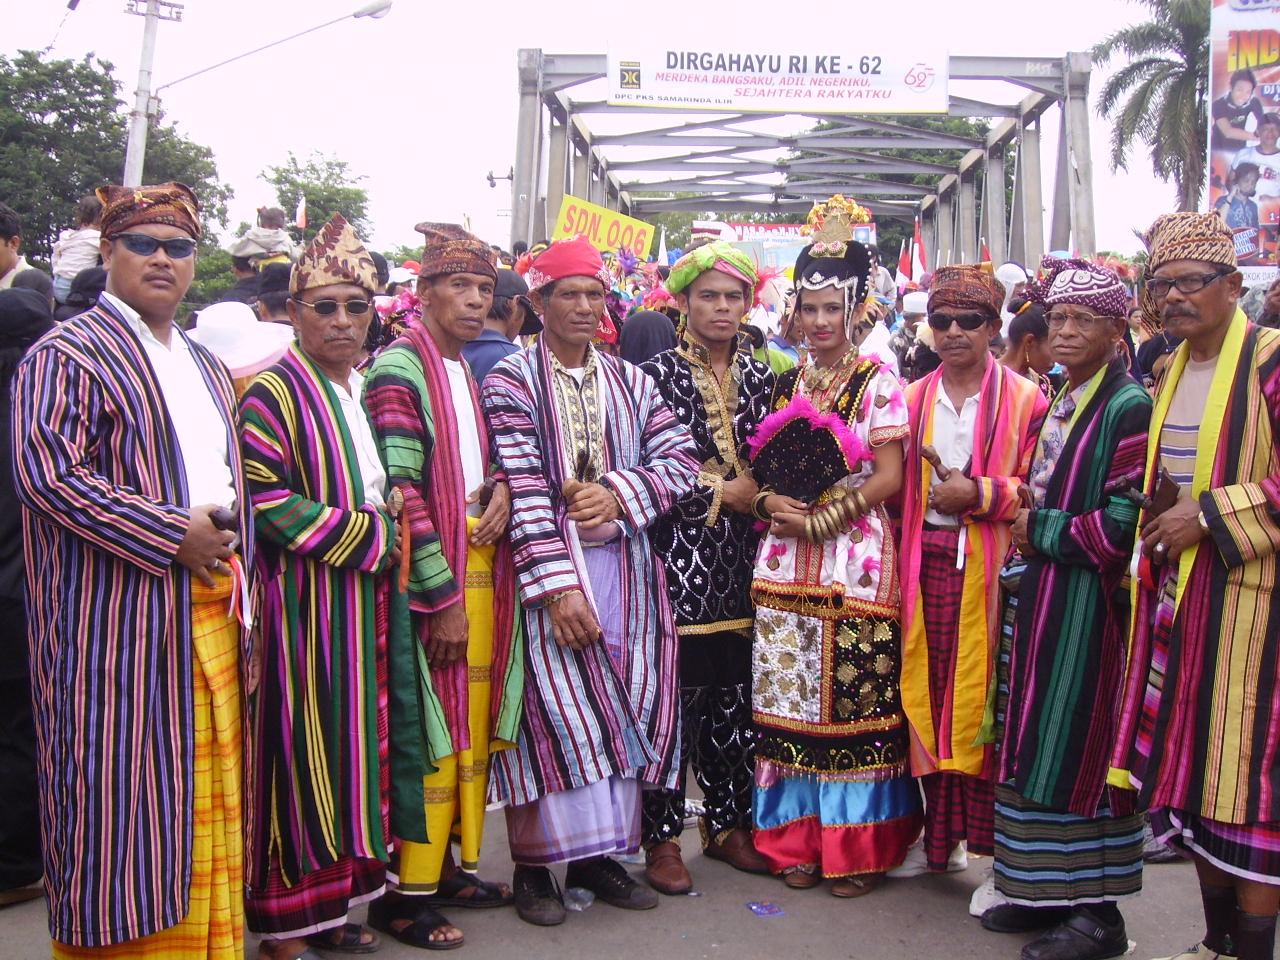 Kumpulan+Sejarah Sejarah+Suku+Buton+di+Sulawesi